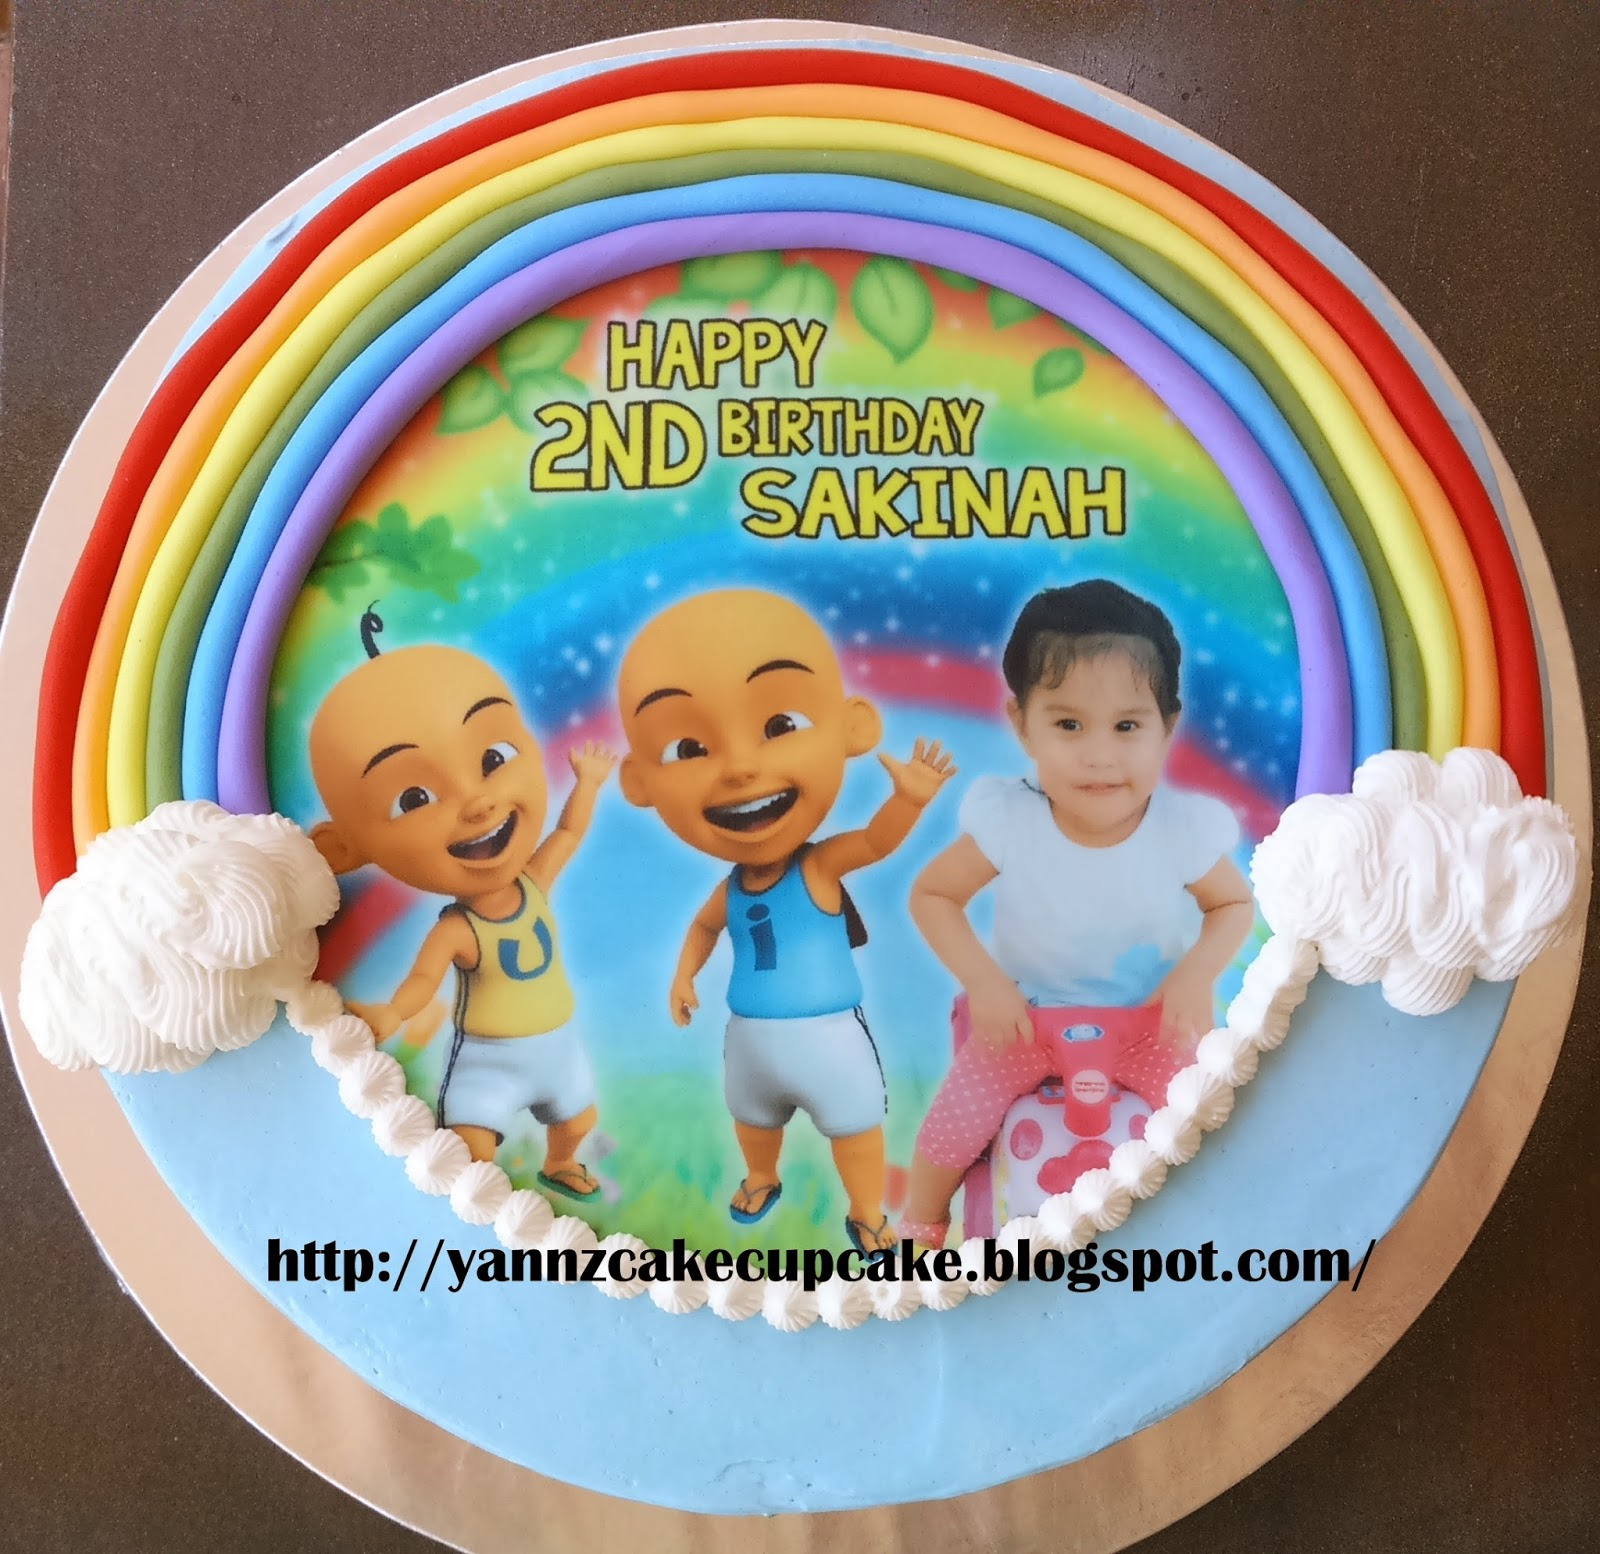 Cake Cupcake By Yannz Upin Ipin for Sakinah